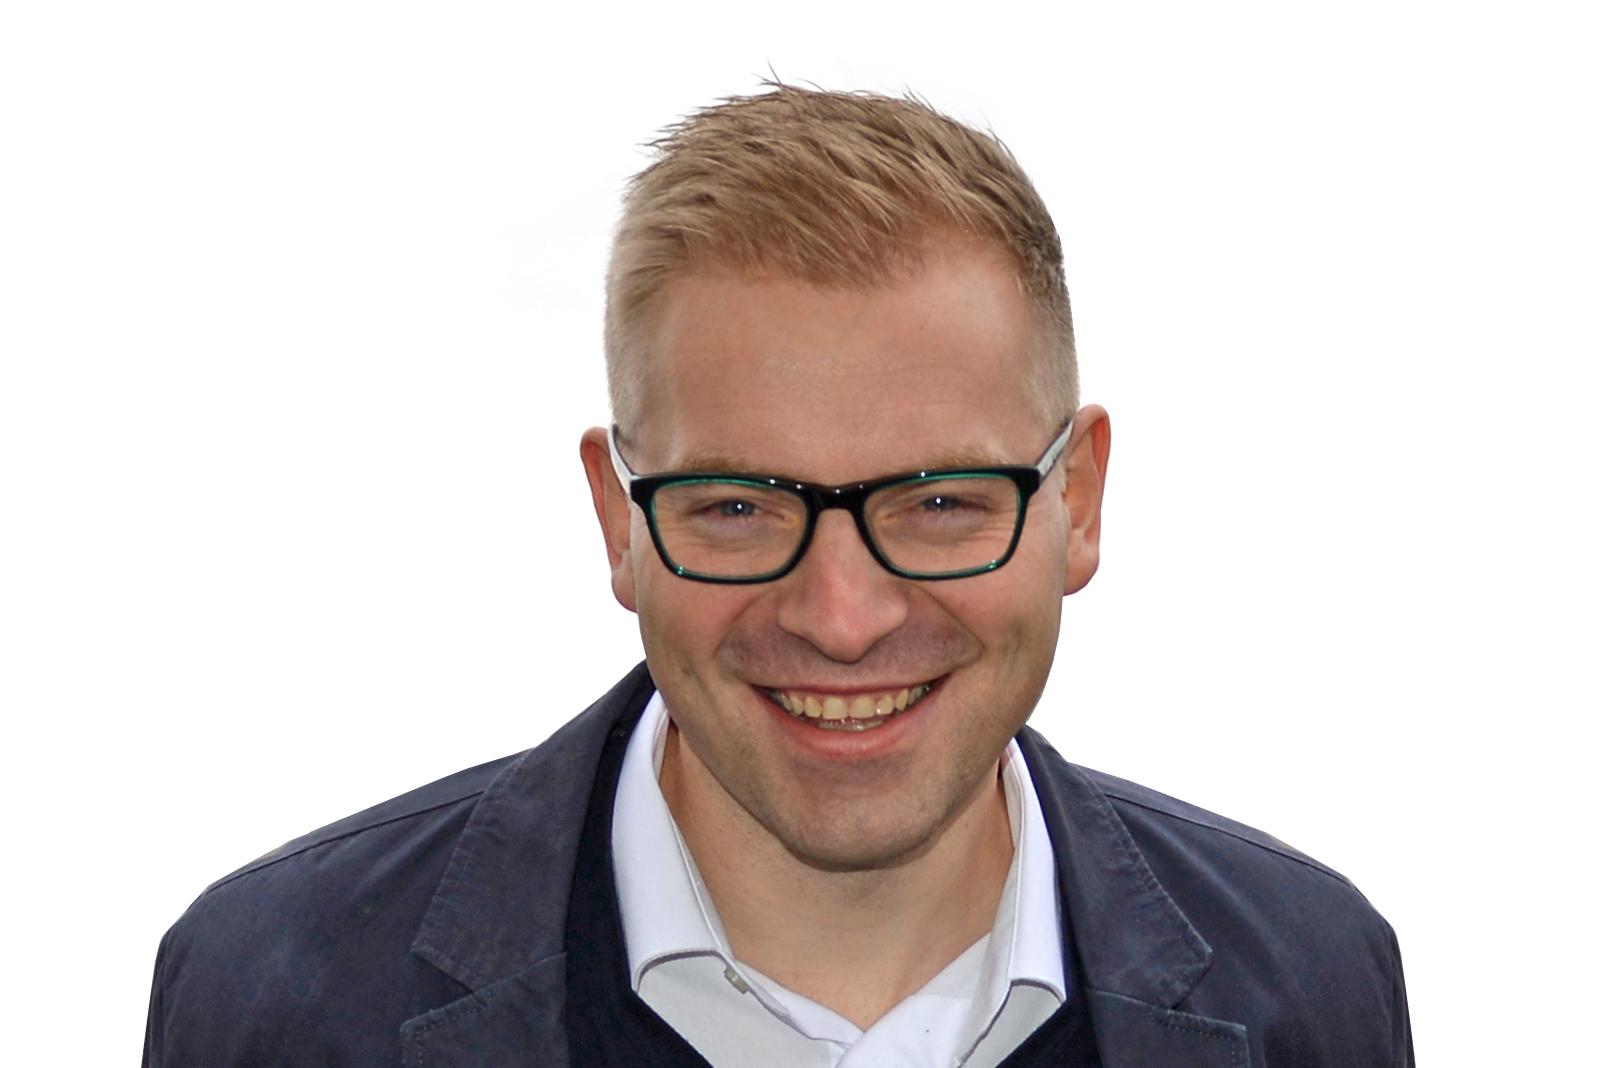 Christian Stieg